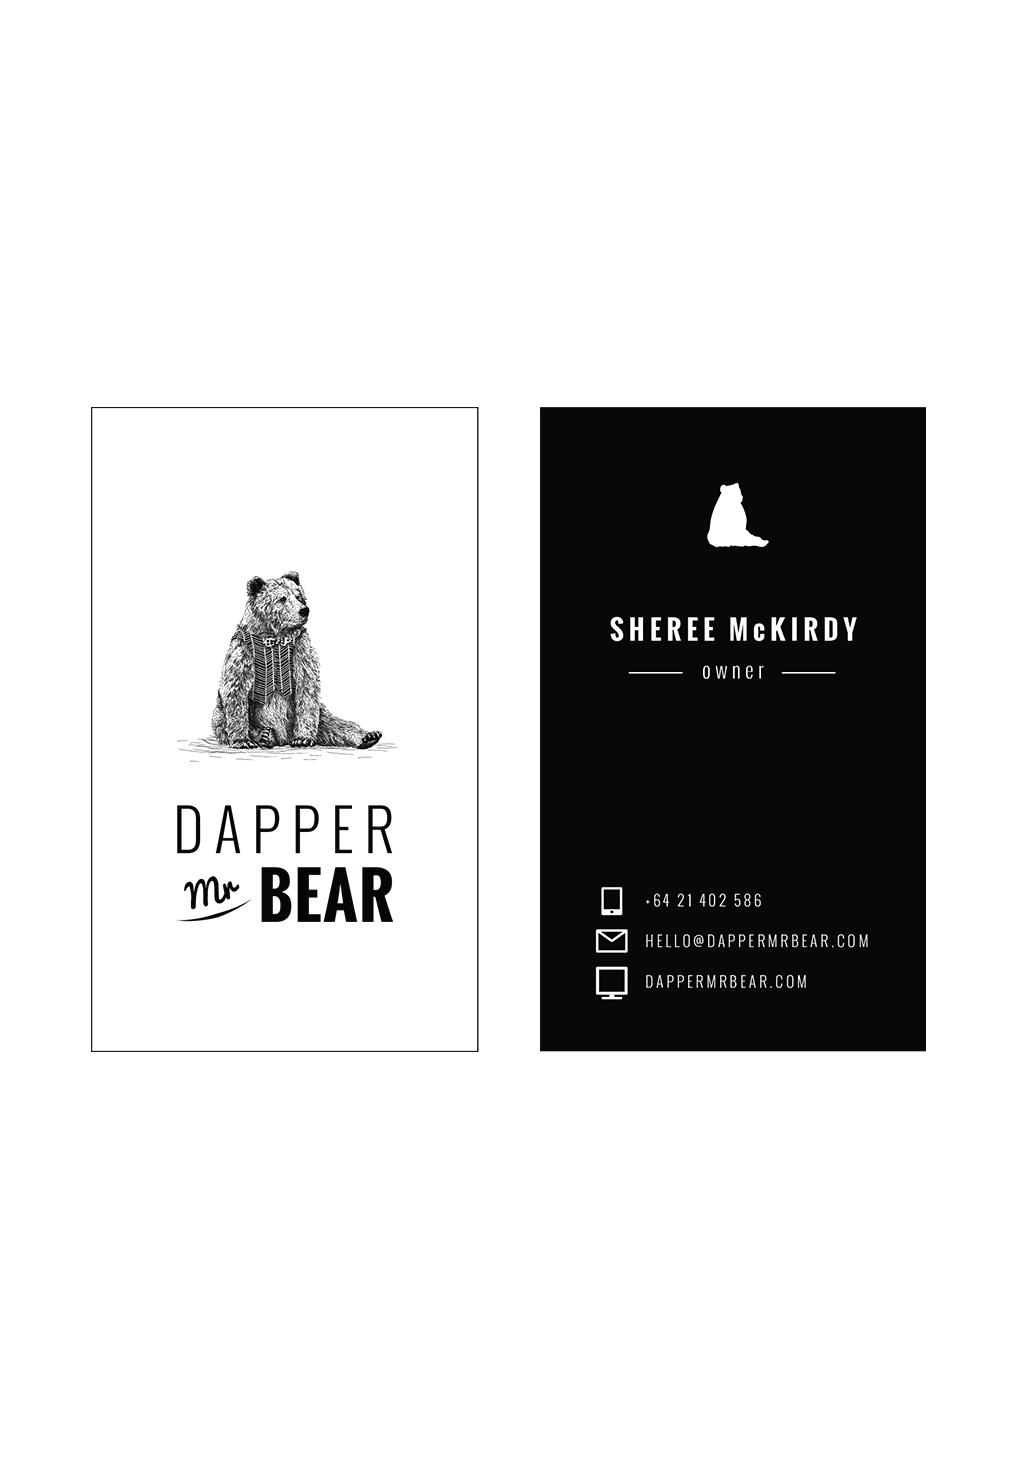 Dapperbearbusinesscardsweb.png